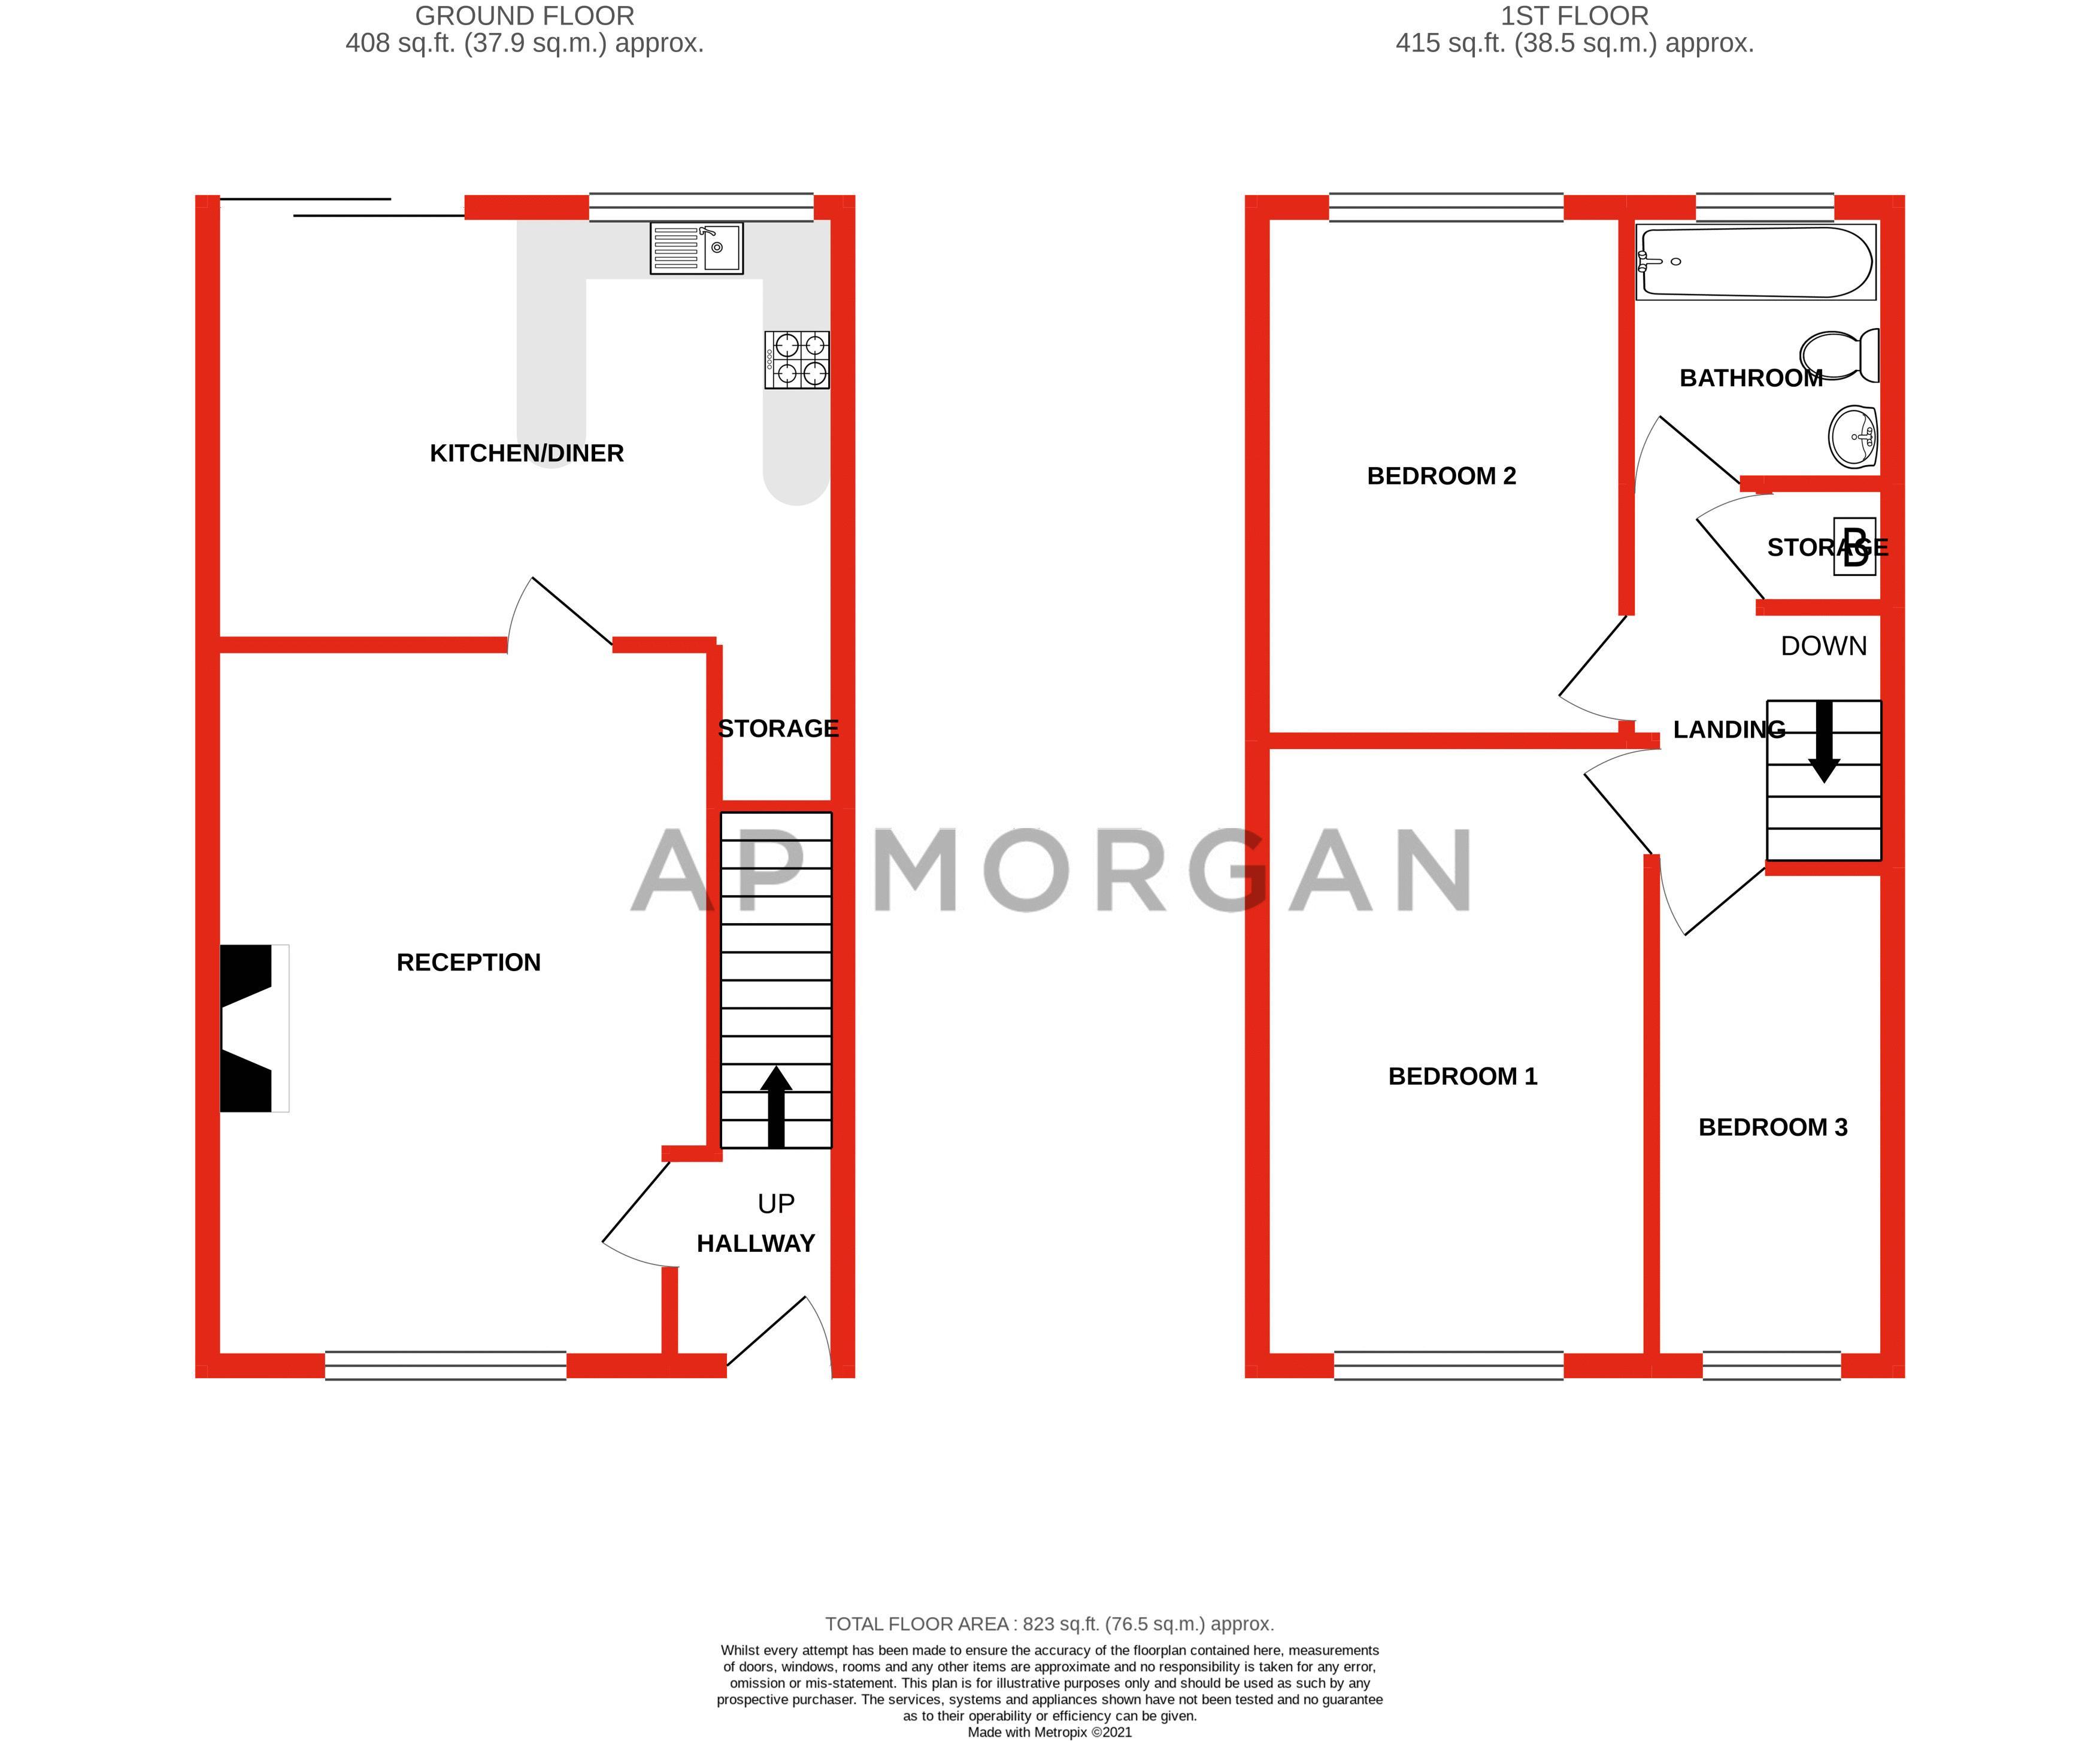 3 bed  for sale in Greenvale - Property Floorplan